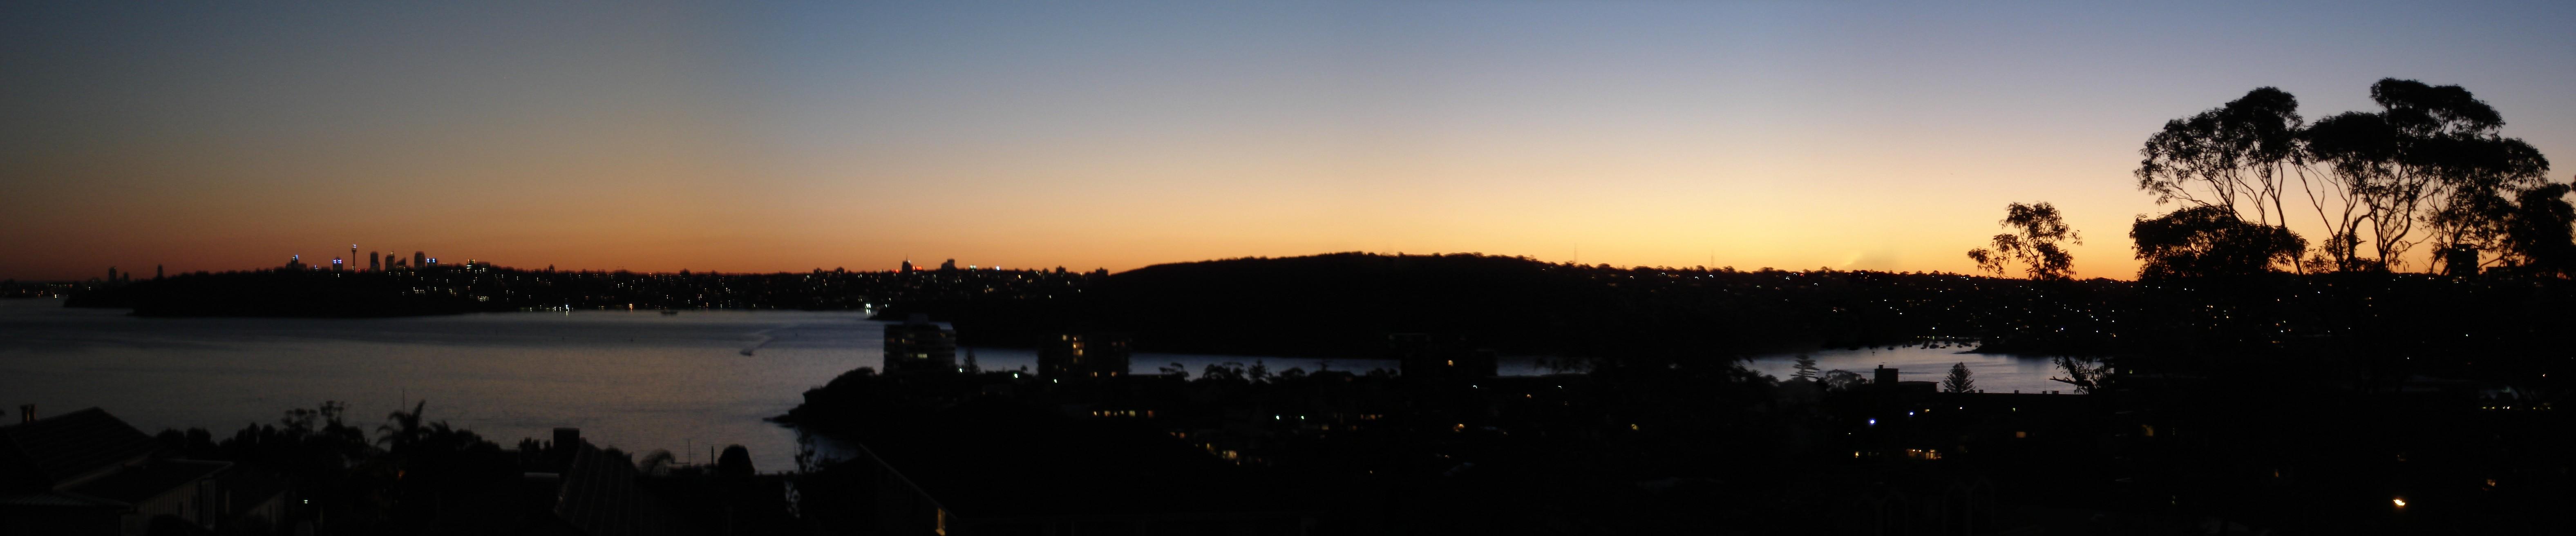 Sunset23.jpg